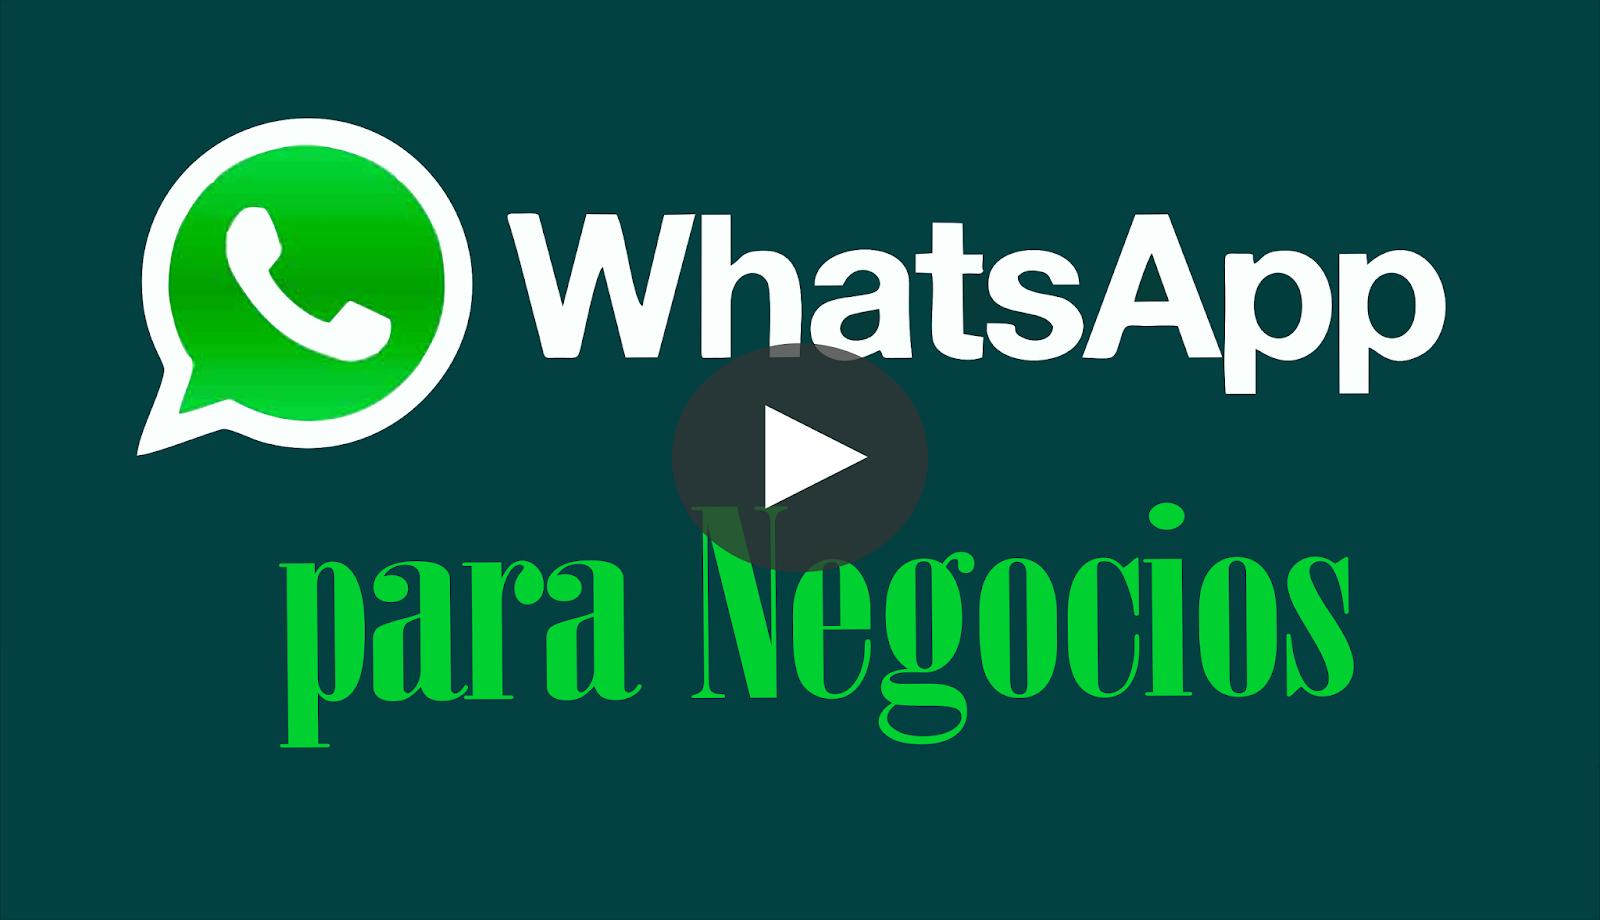 Cómo usar Whatsapp para Negocios